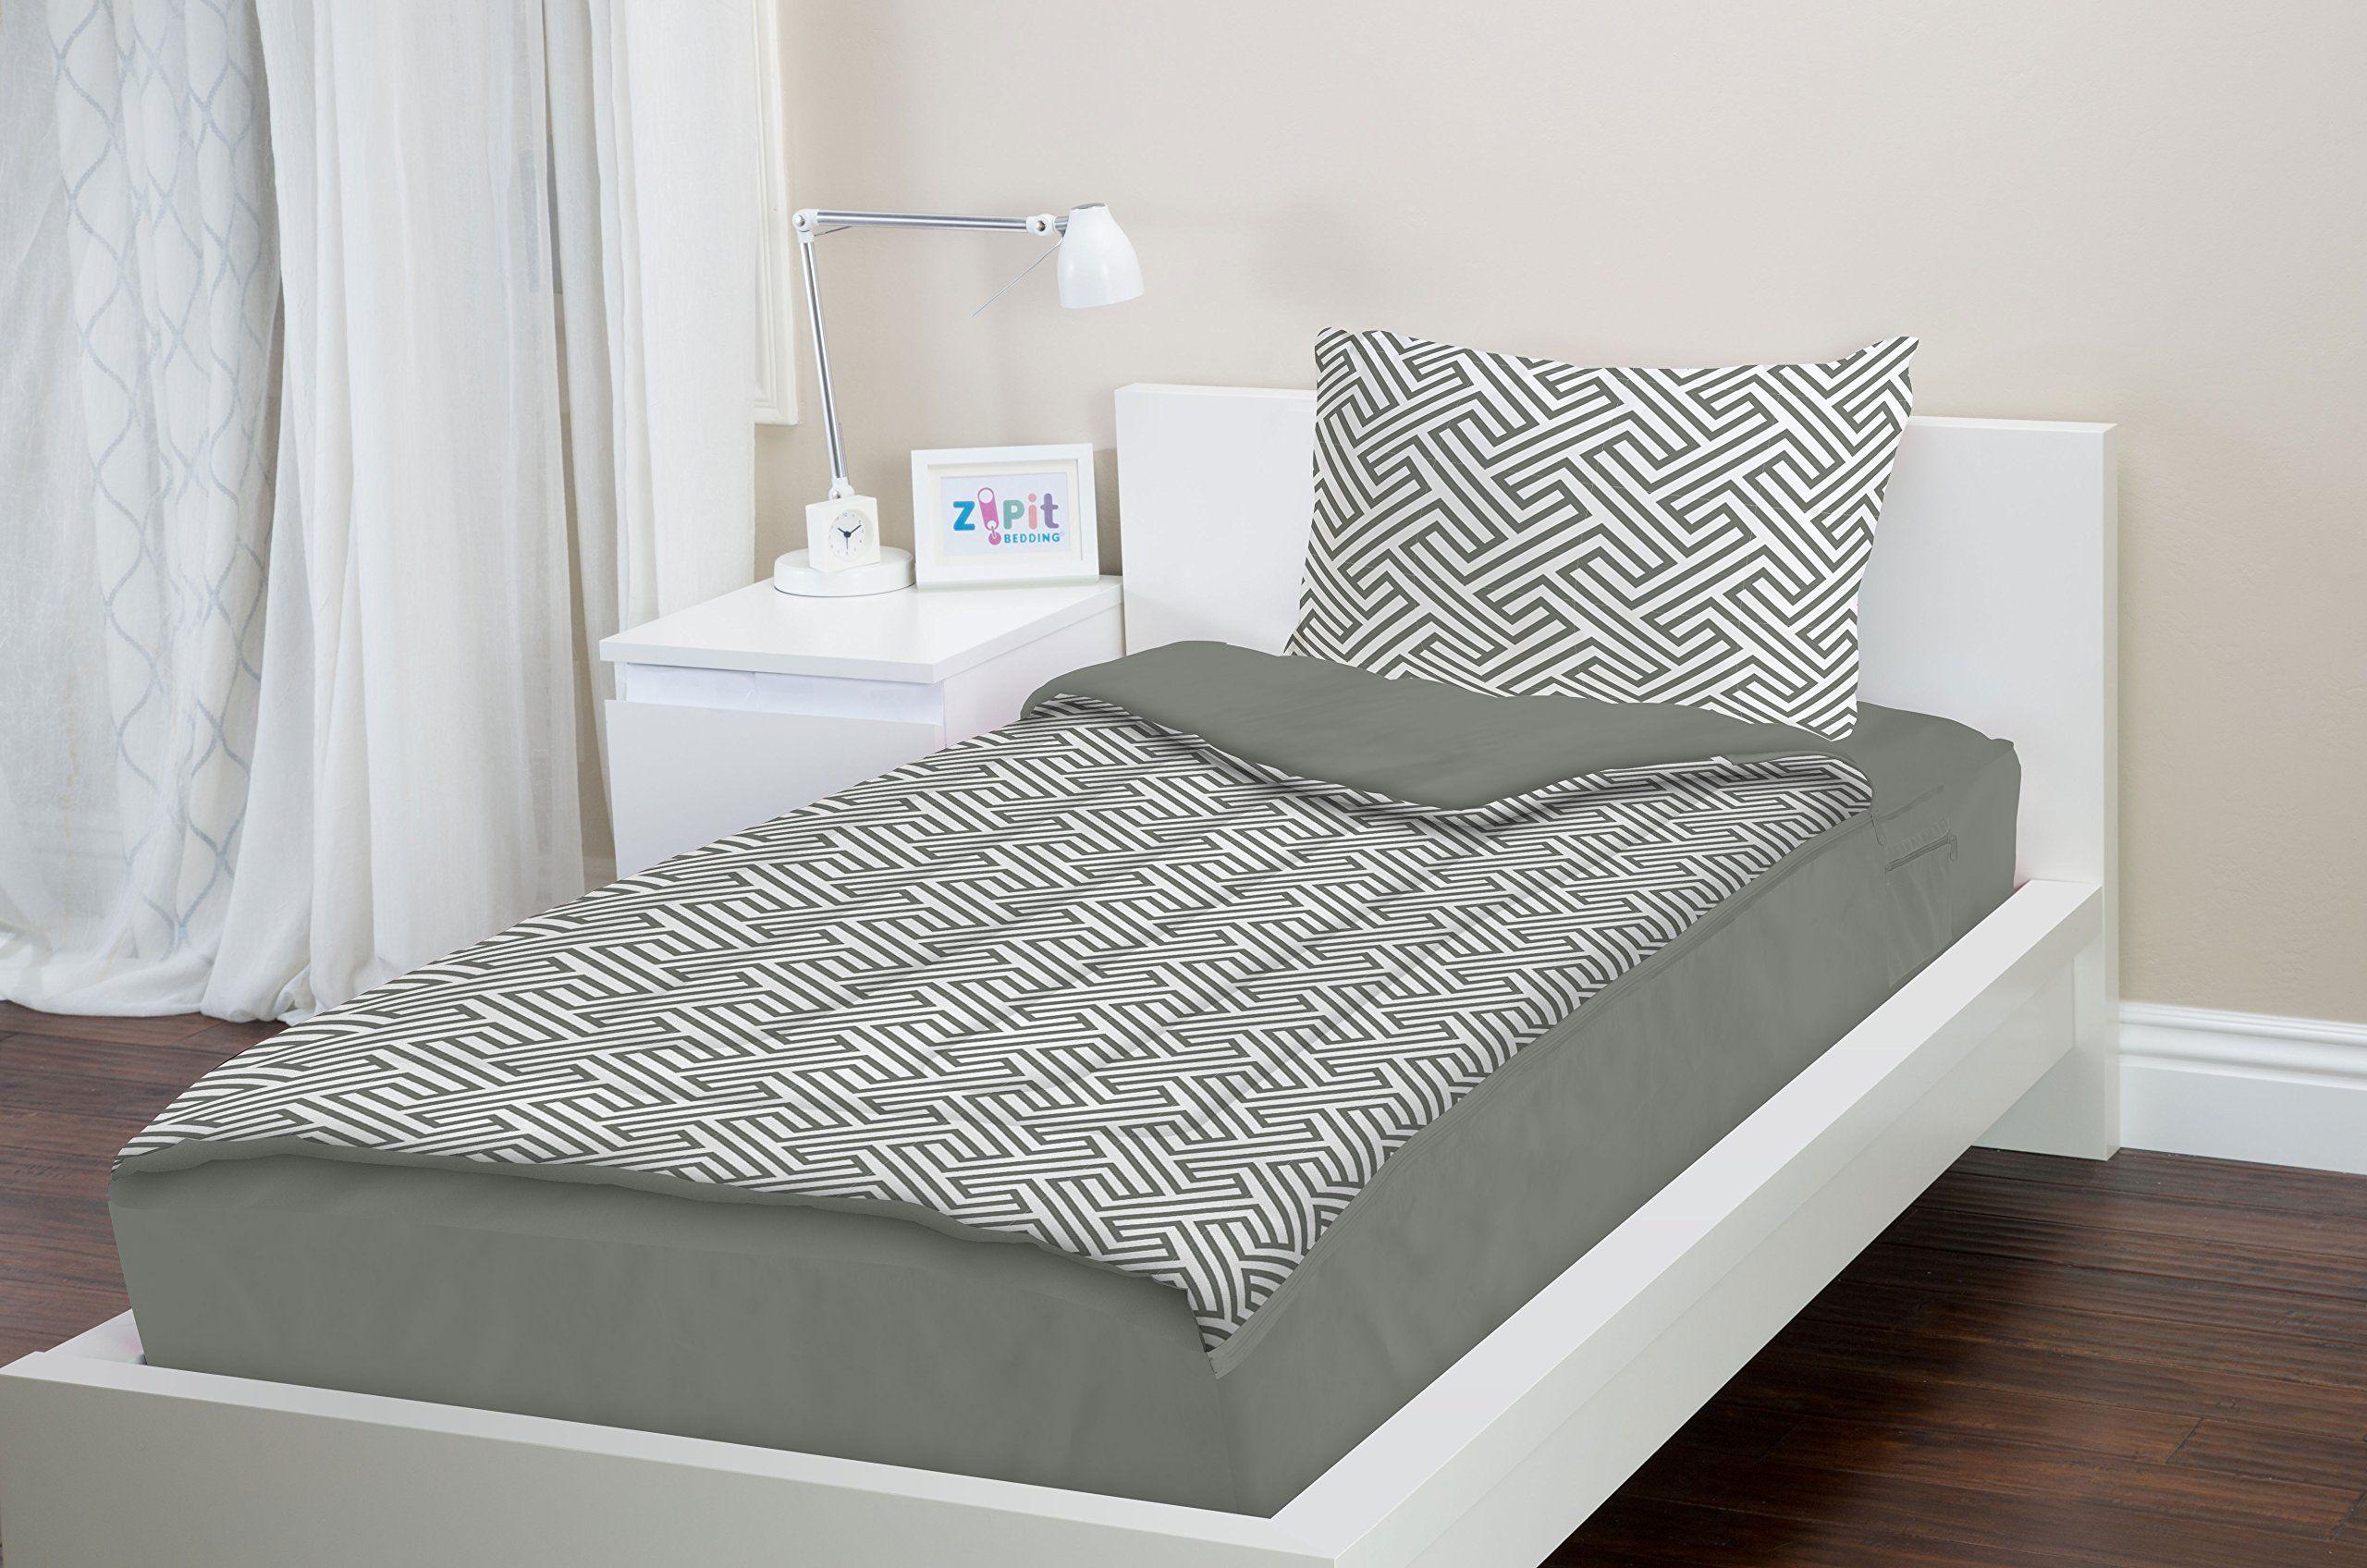 Amazon Com Zipit Bedding Set Full Gray Geometric Zip Up Your